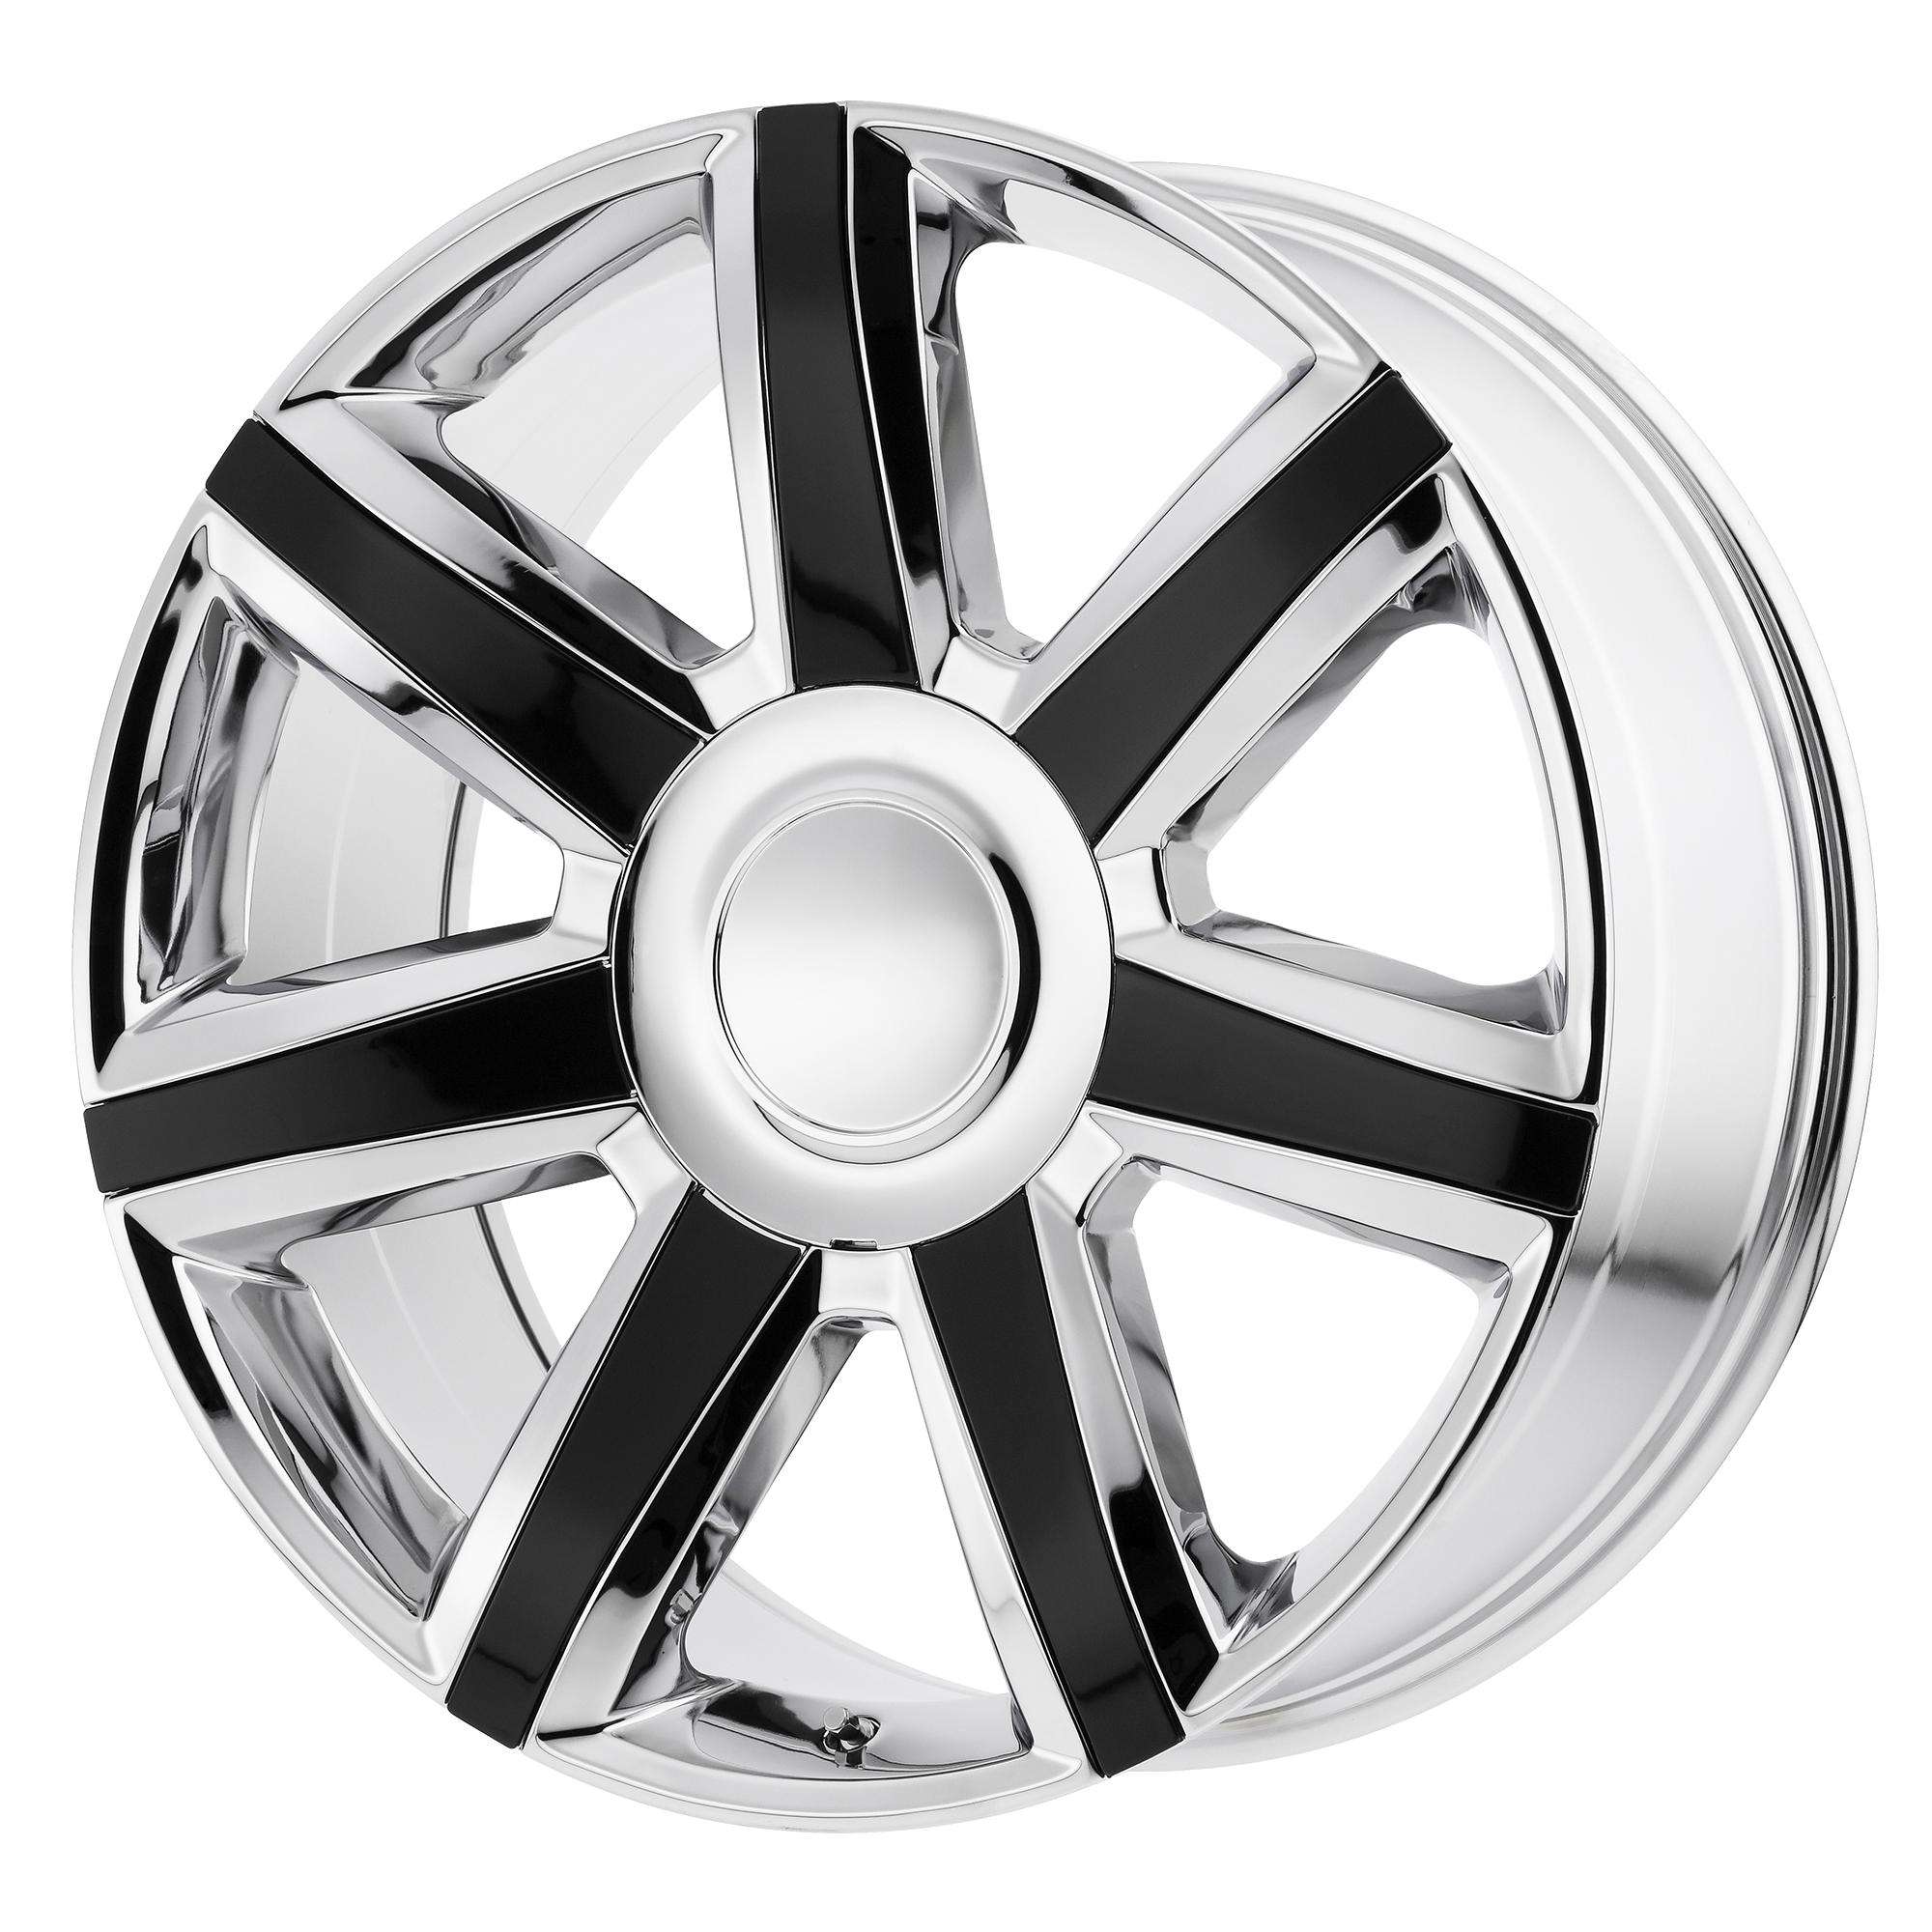 OE Creations Replica Wheels OE Creations PR164 Chrome w/ Gloss Black Accents